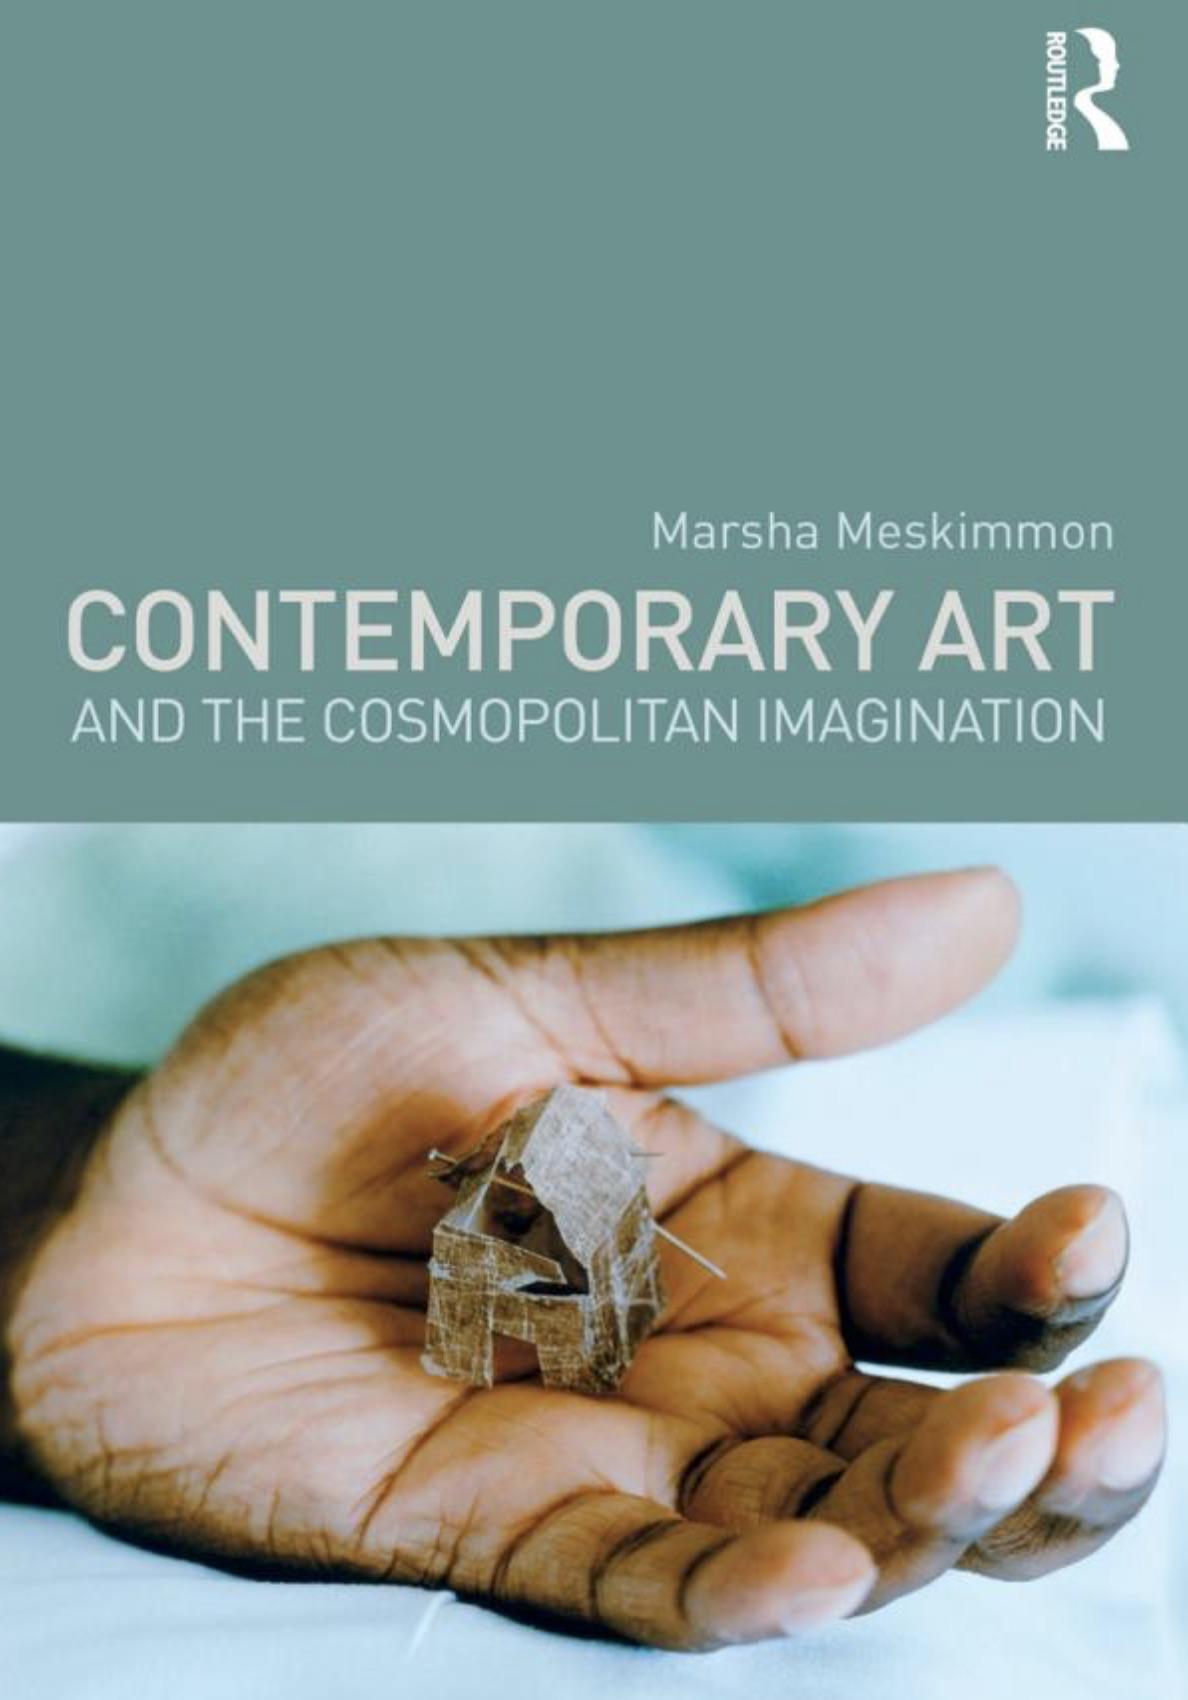 Art History: Journal of the Association for Art History - 2012